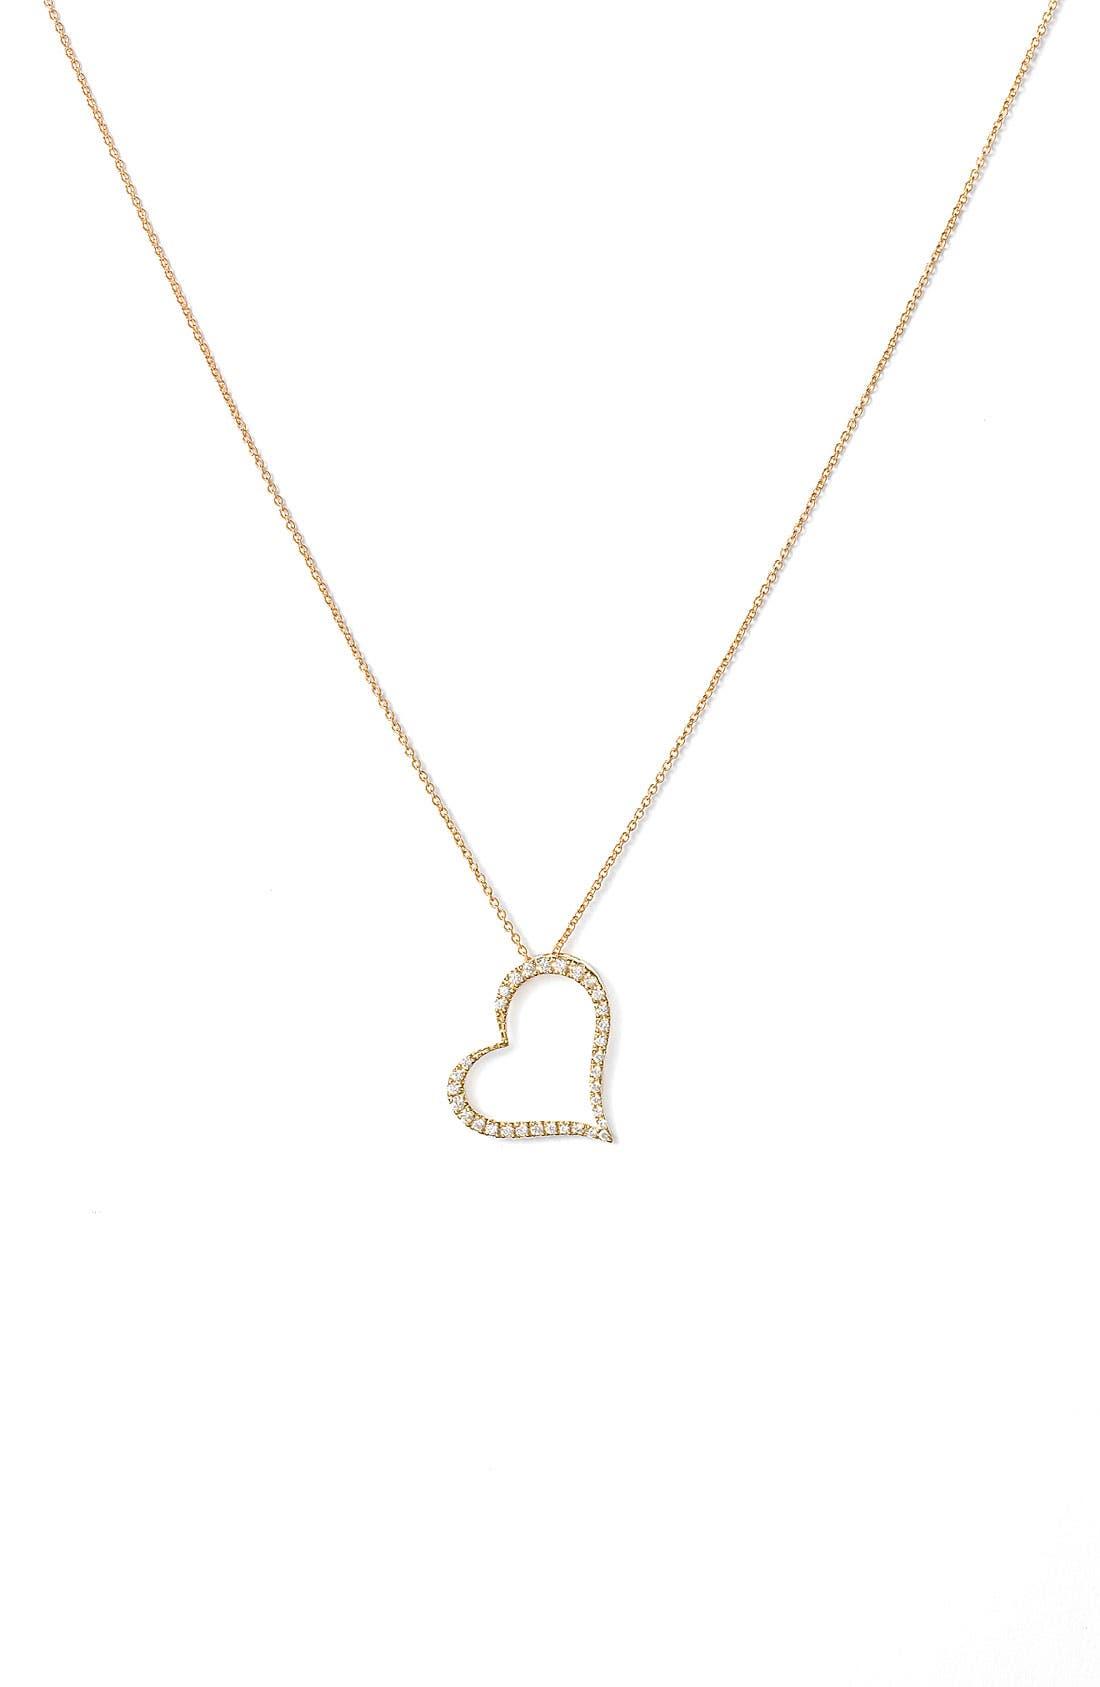 Slanted Diamond Heart Pendant Necklace,                             Main thumbnail 1, color,                             YELLOW GOLD